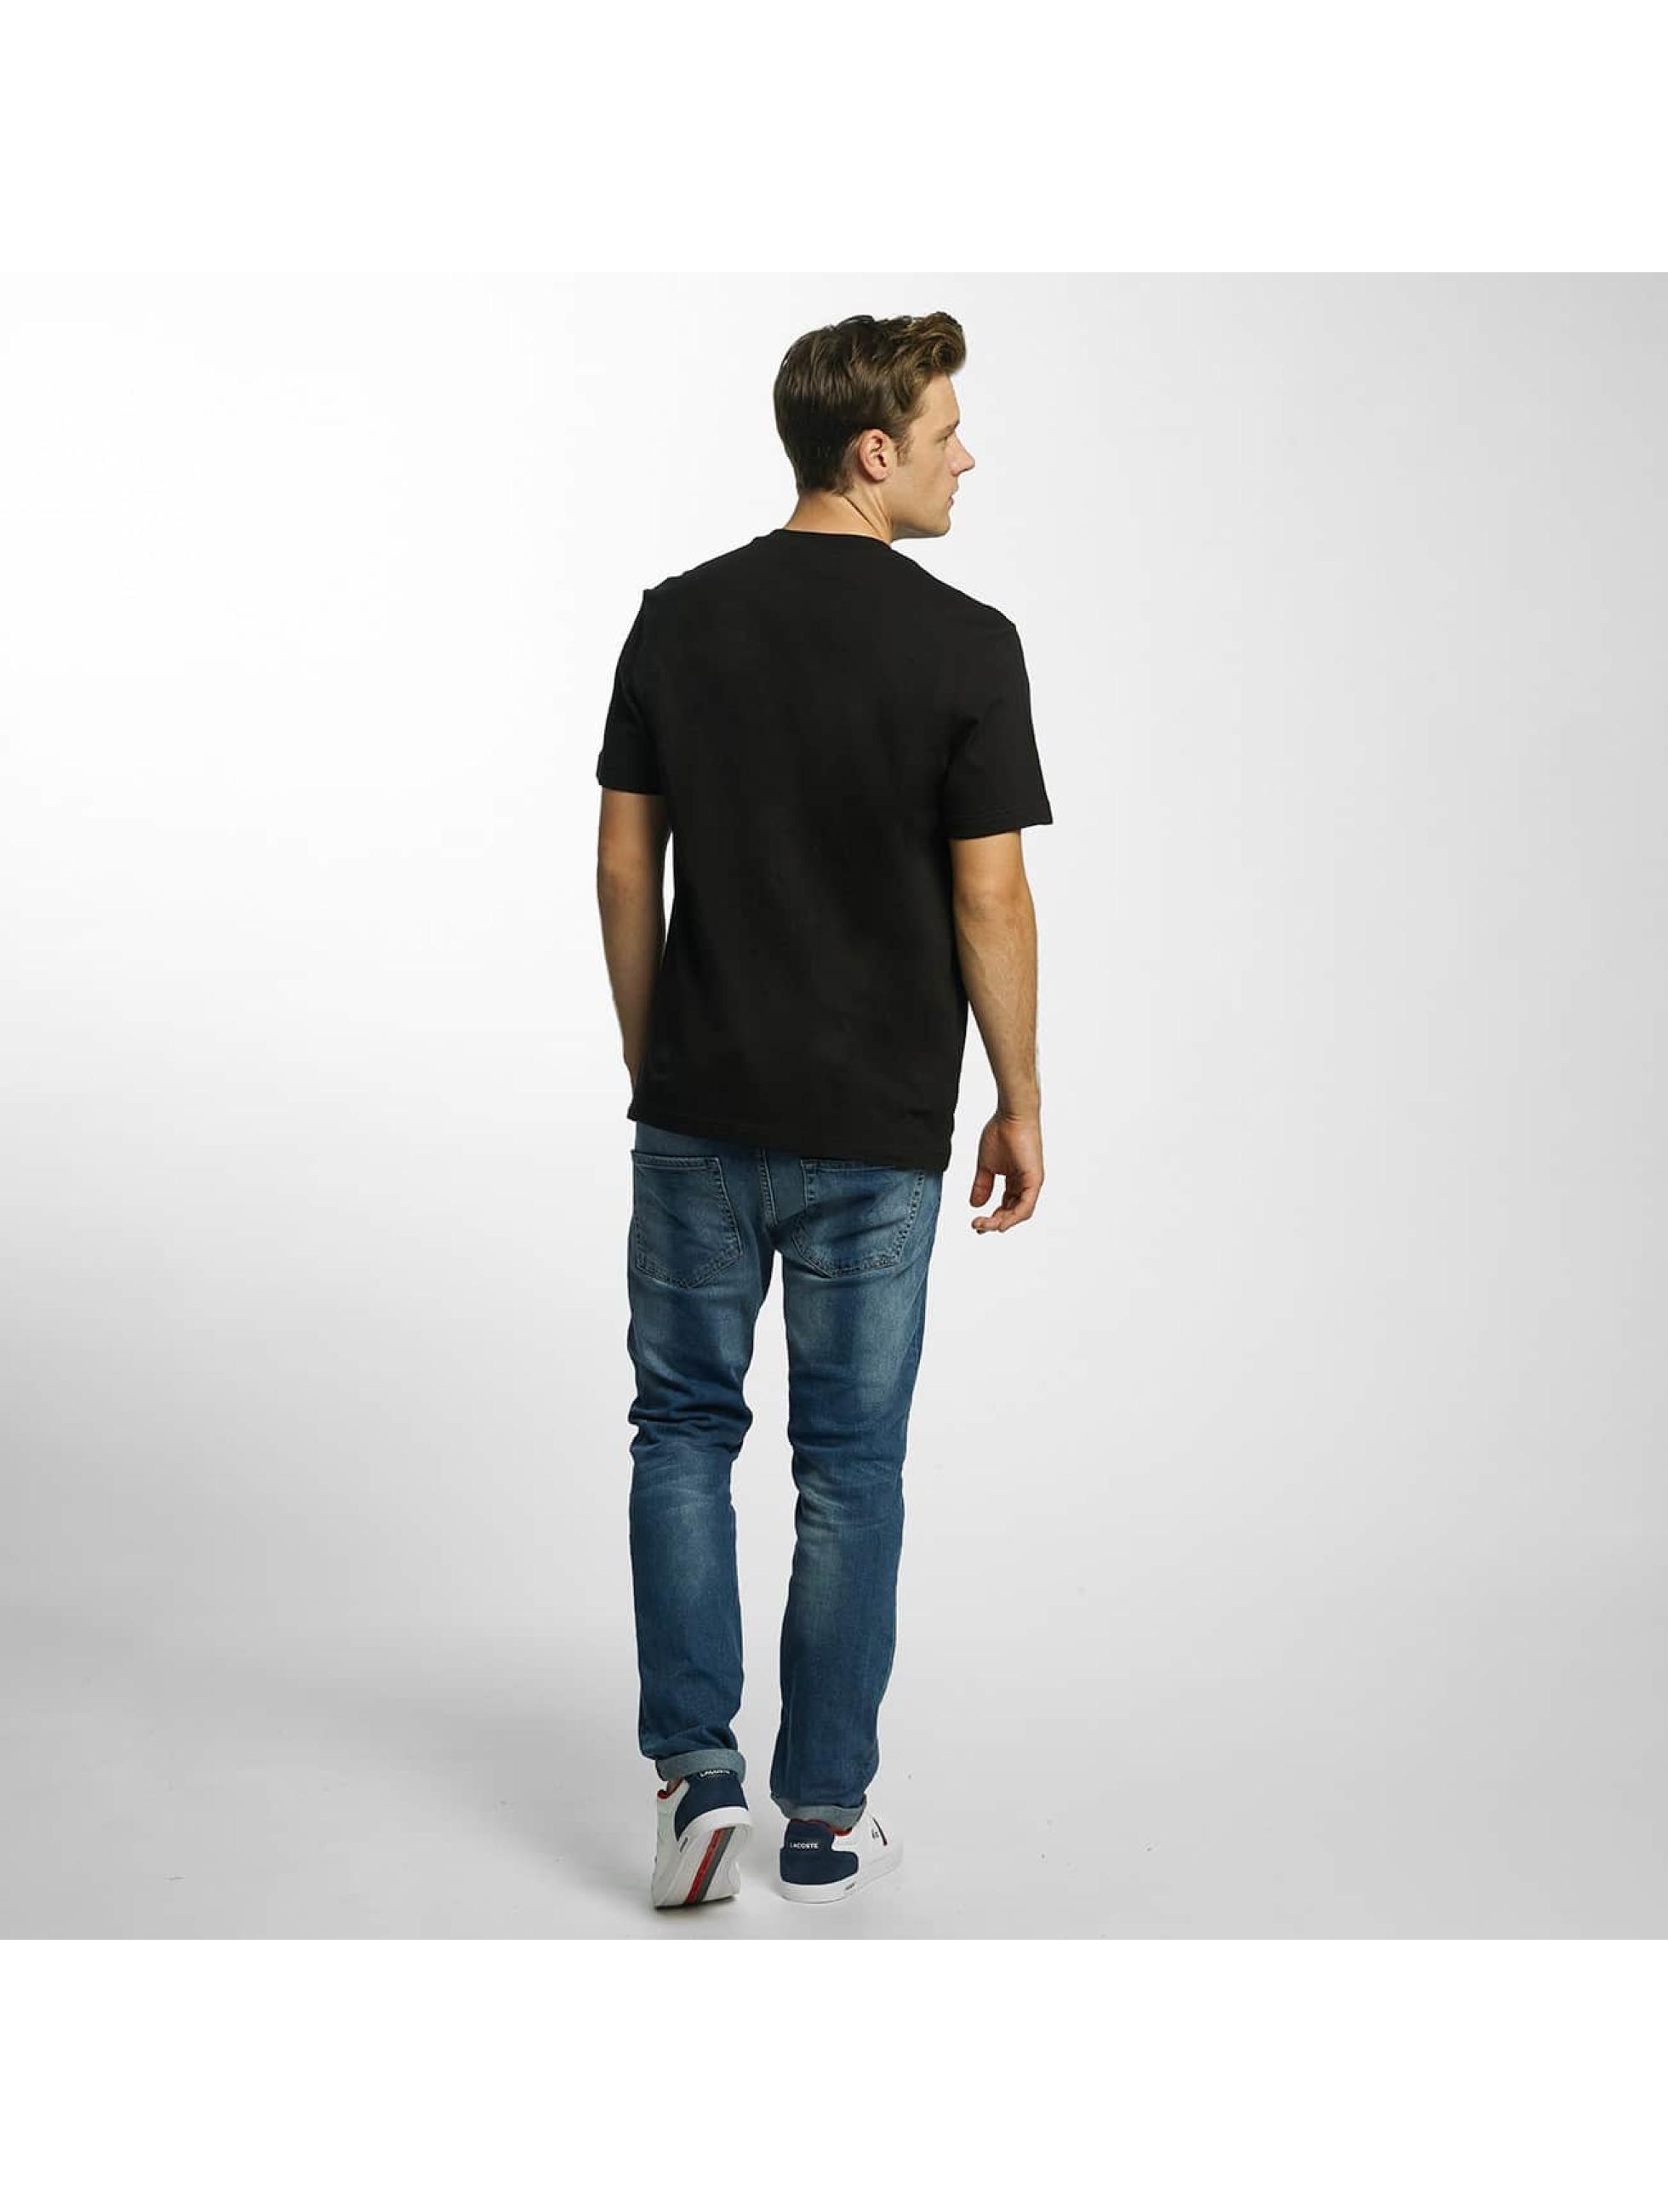 Lacoste T-Shirt Original schwarz